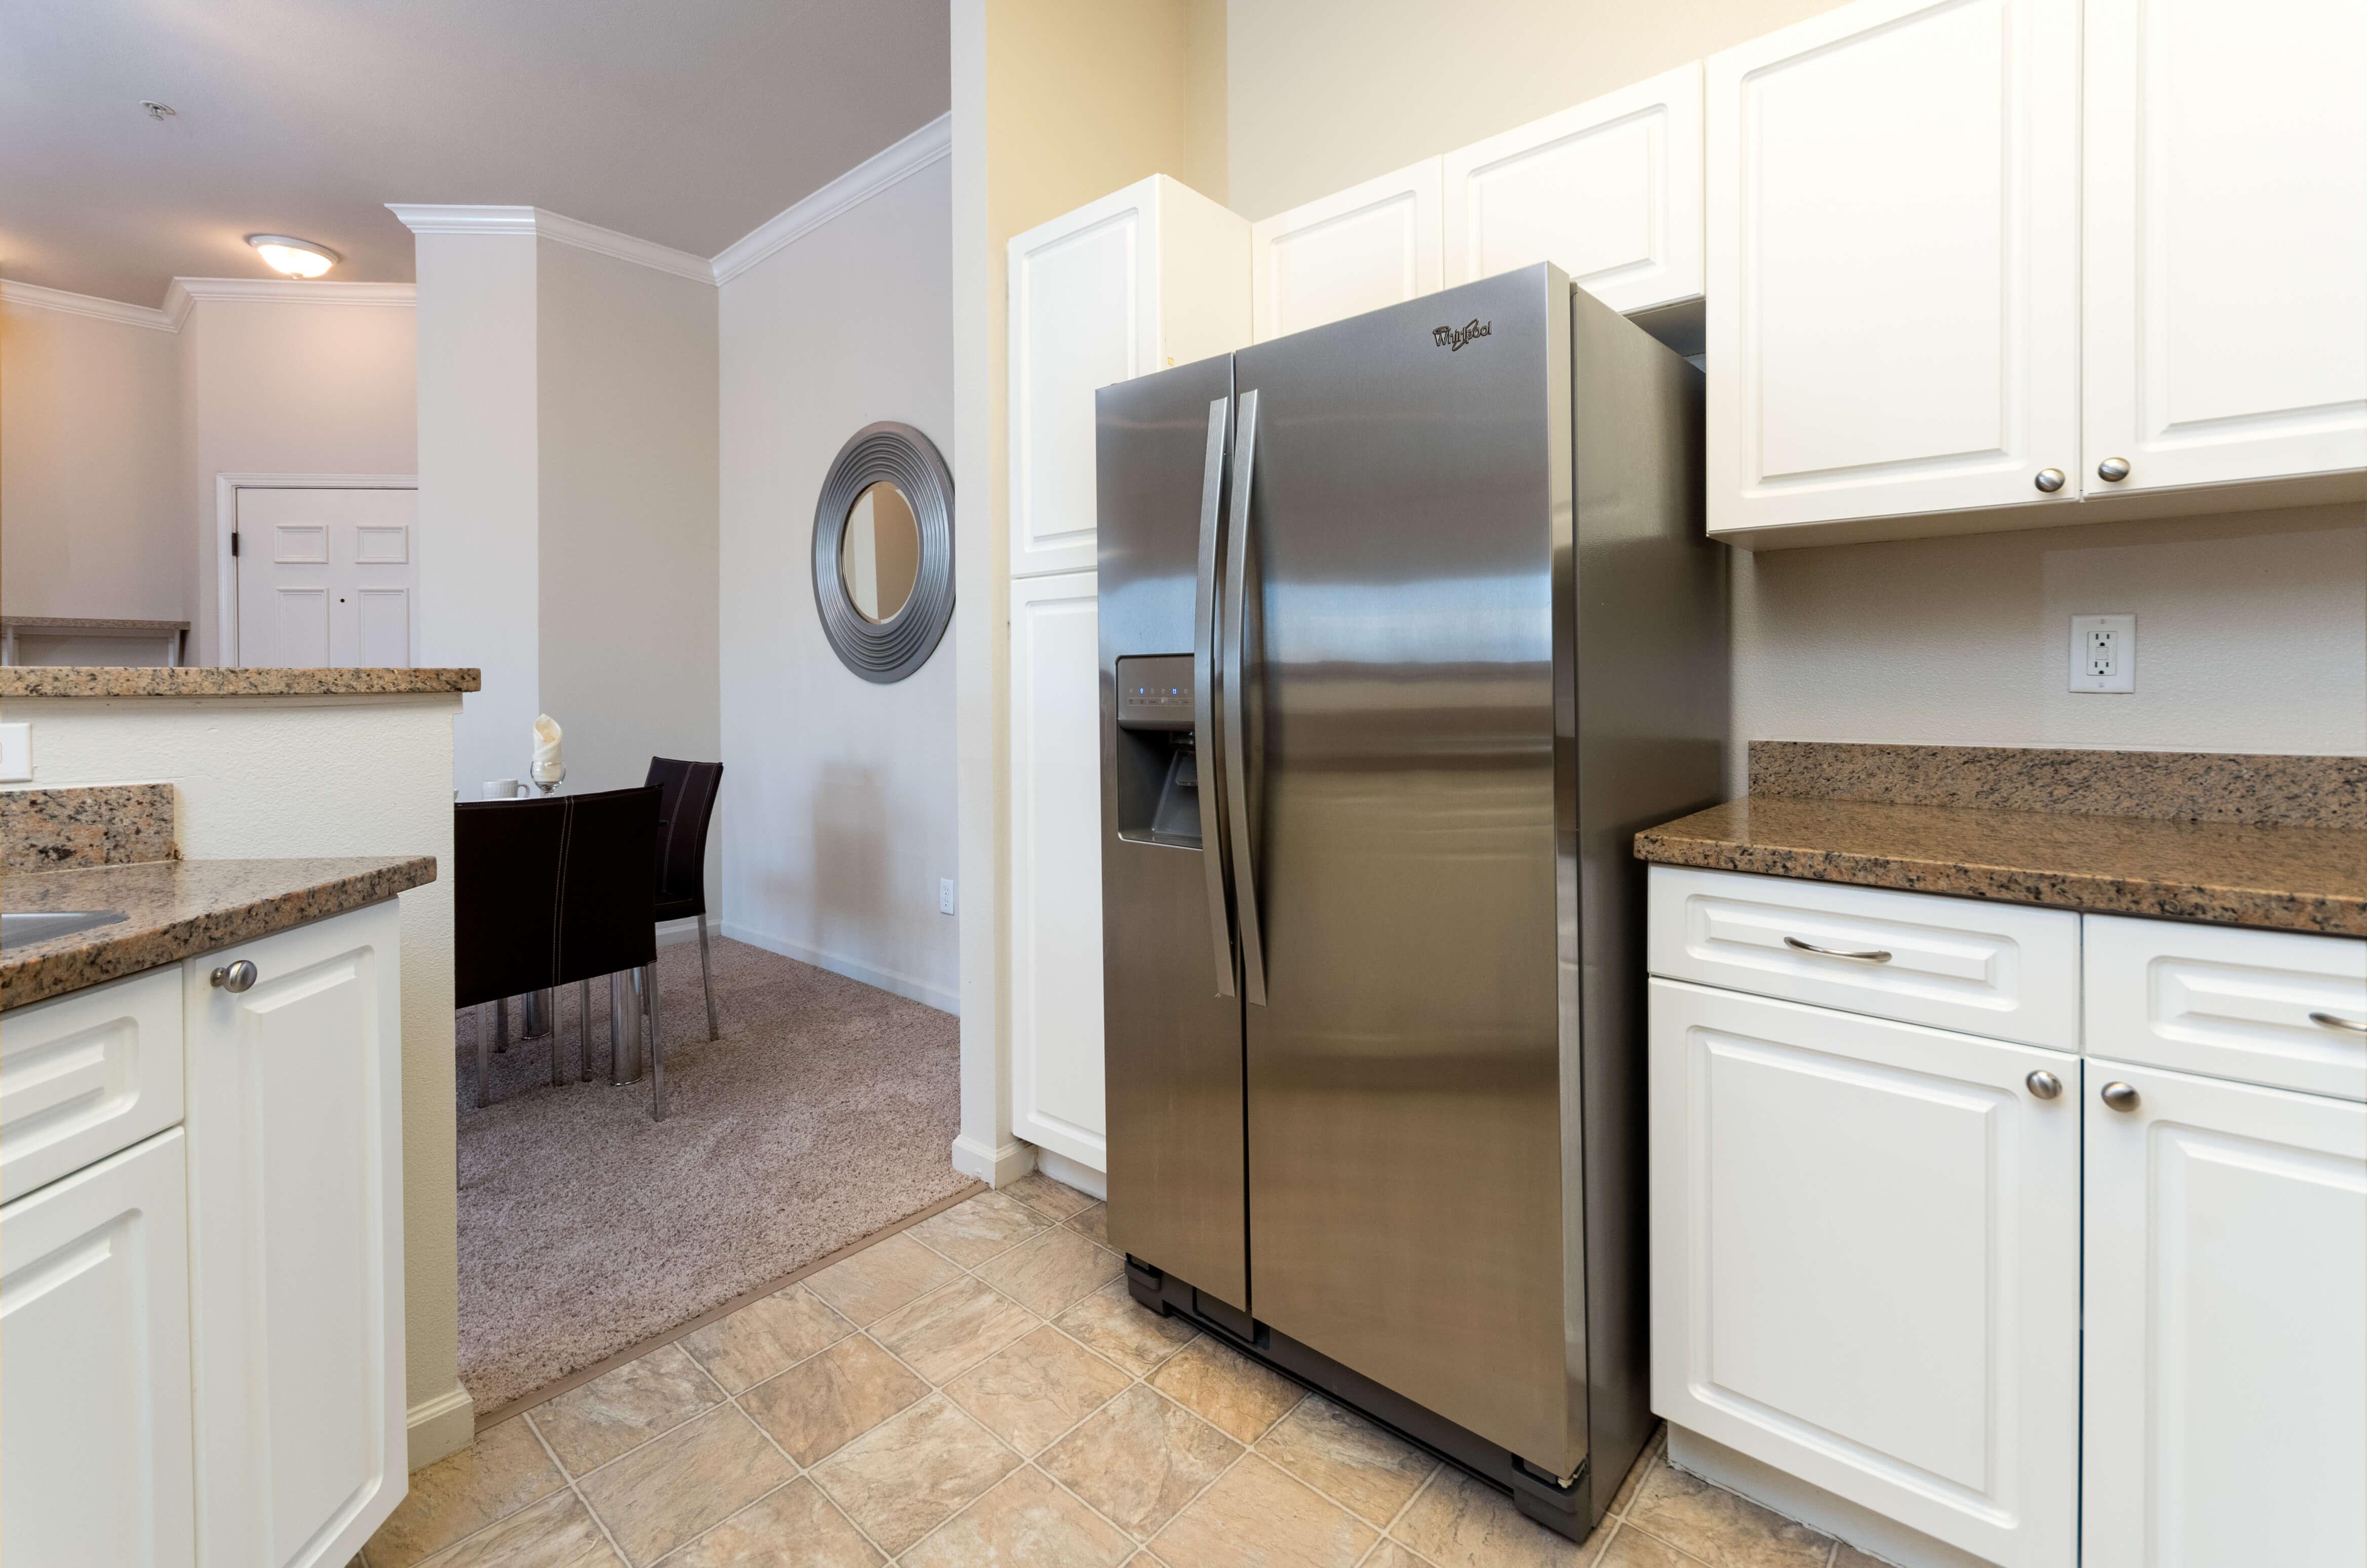 image 5 furnished 3 bedroom Apartment for rent in Santa Clara, Santa Clara County